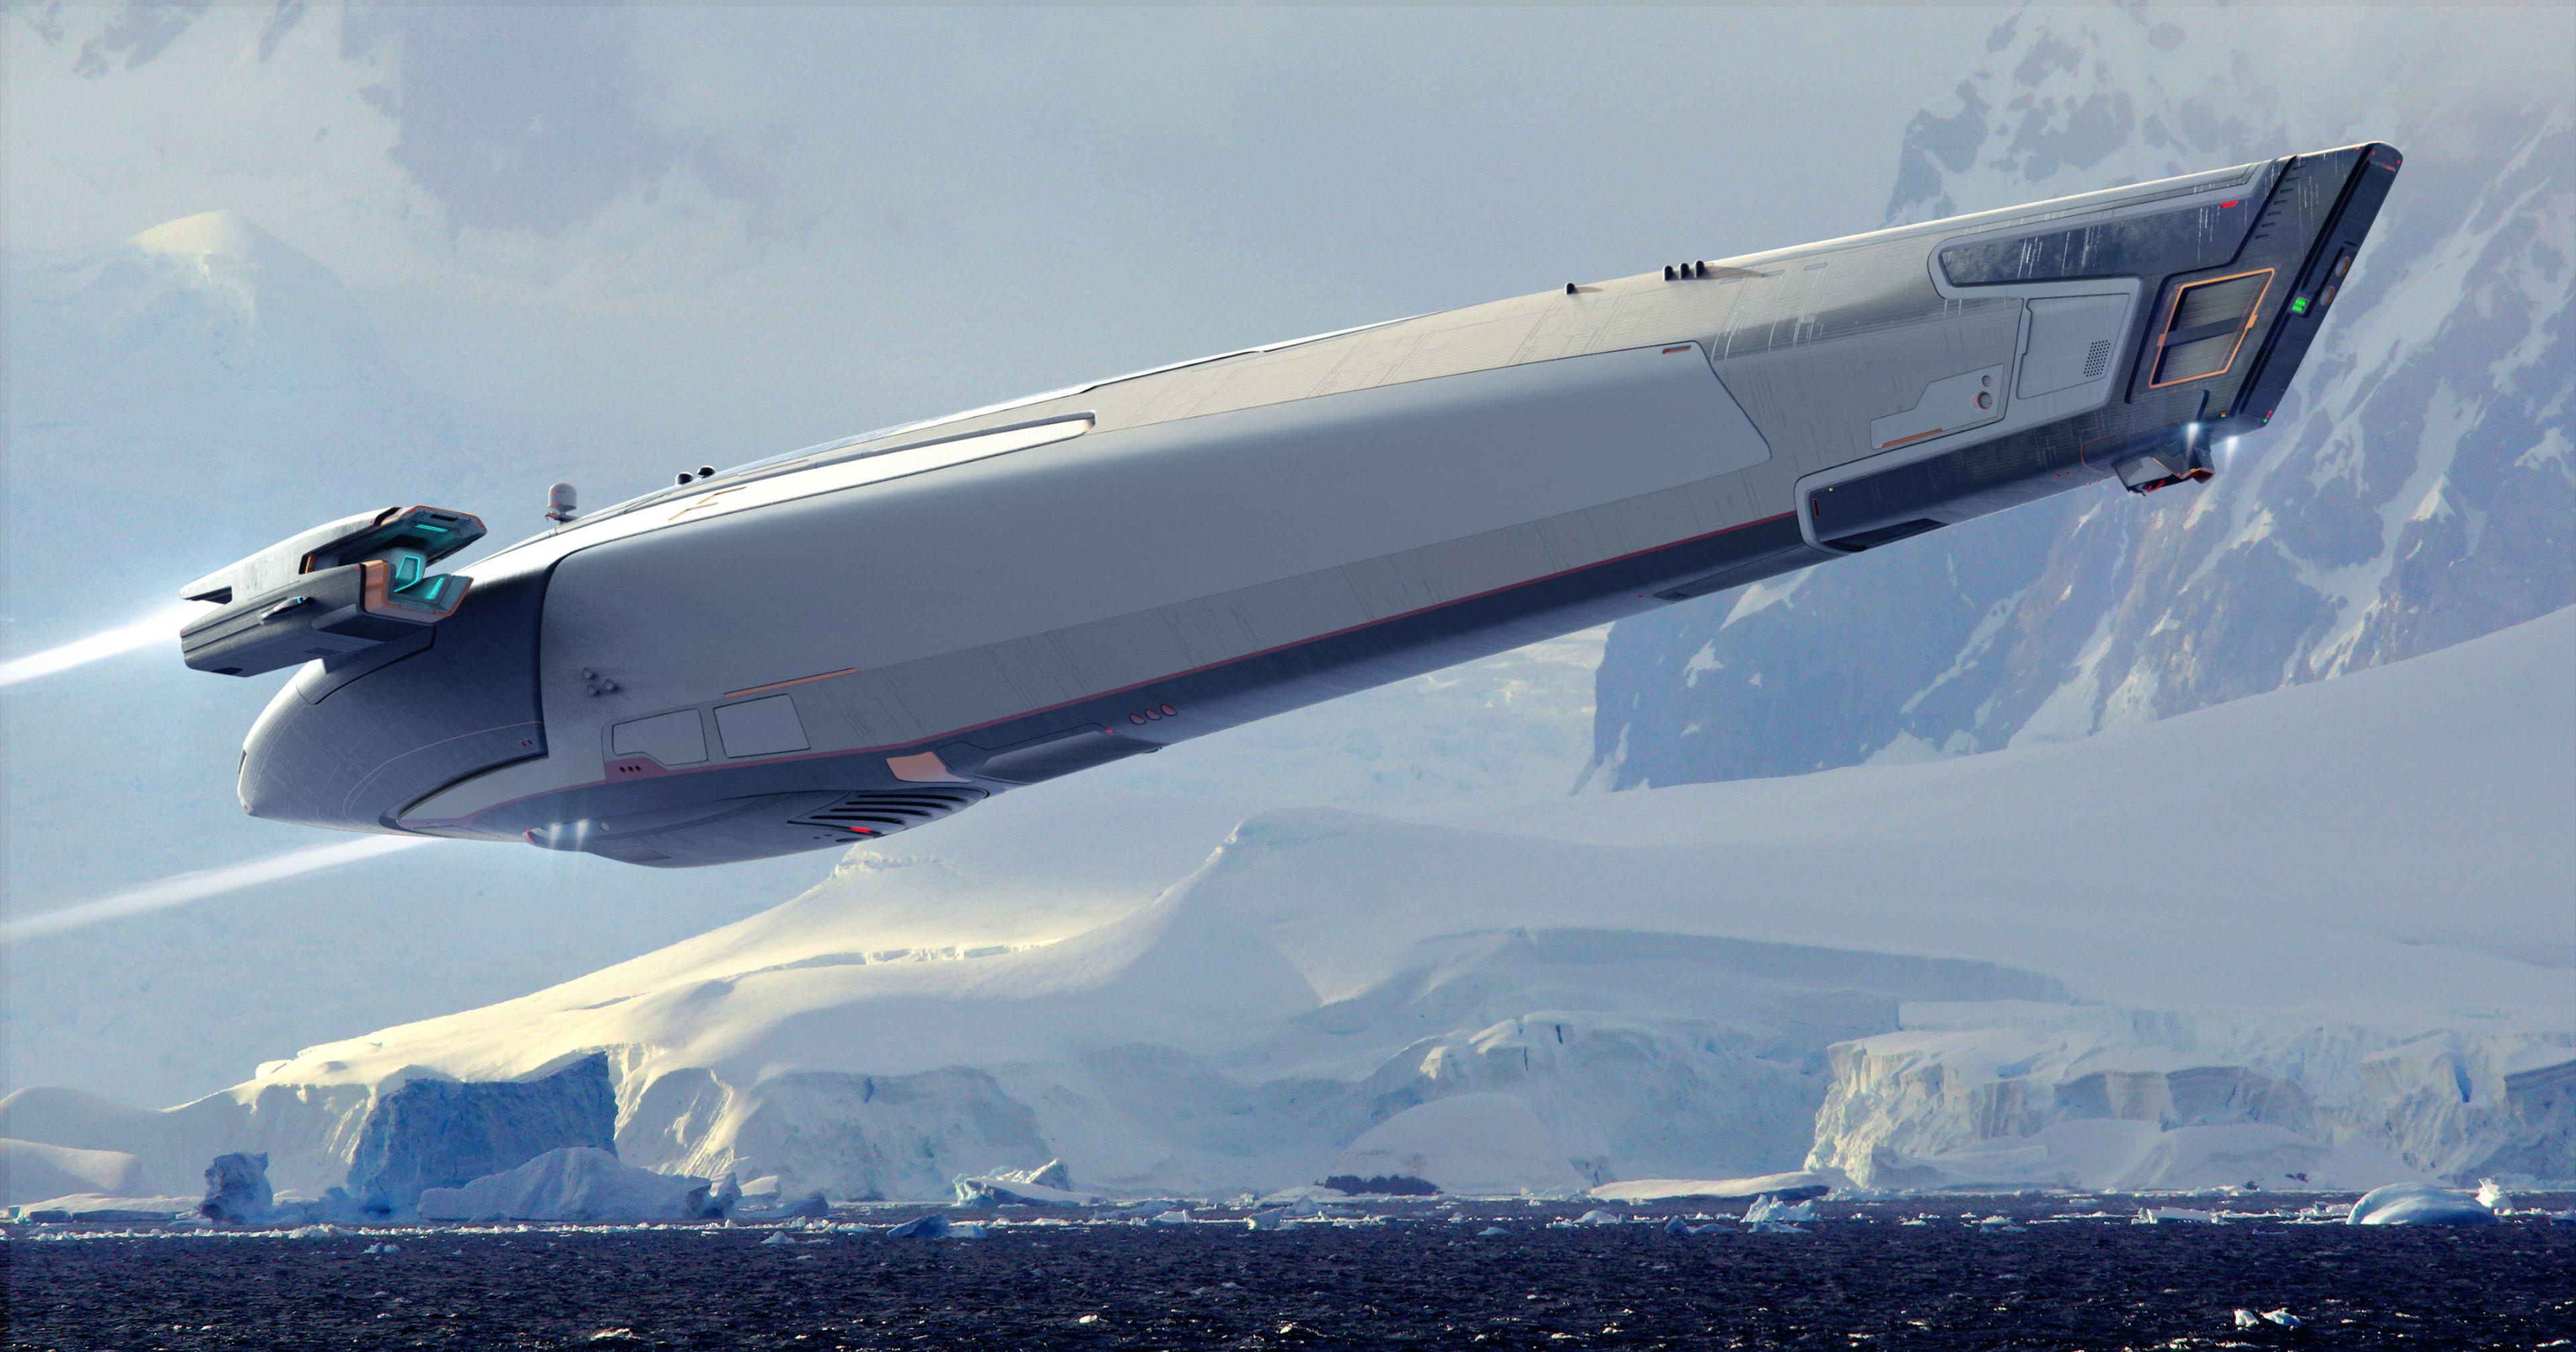 andrian-luchian-antarctica.jpg?159508617